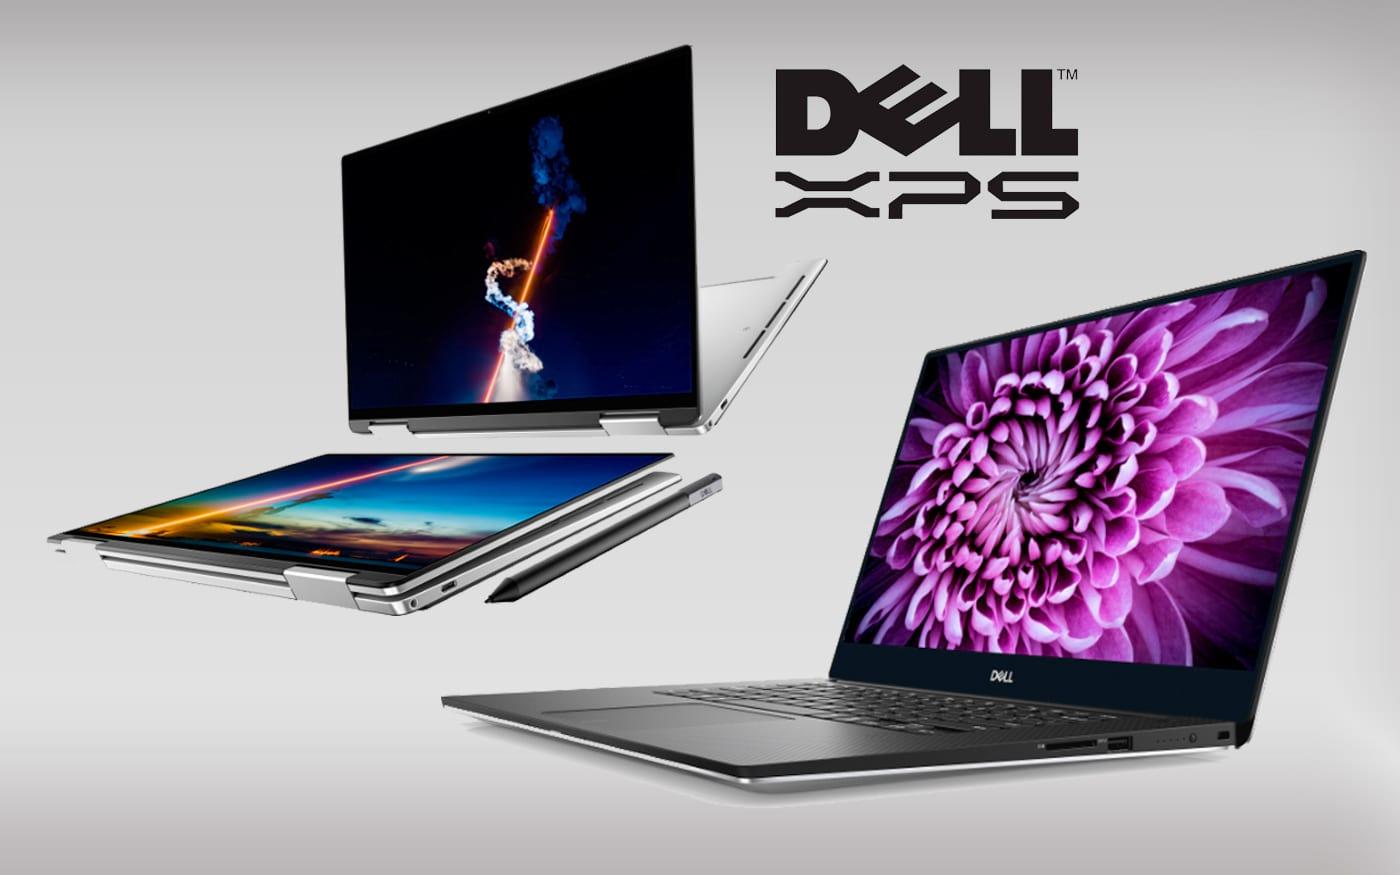 Computex 2019: Dell lança Dell XPS 13 2 em 1 e Dell XPS 15, agora mais compactos e potentes